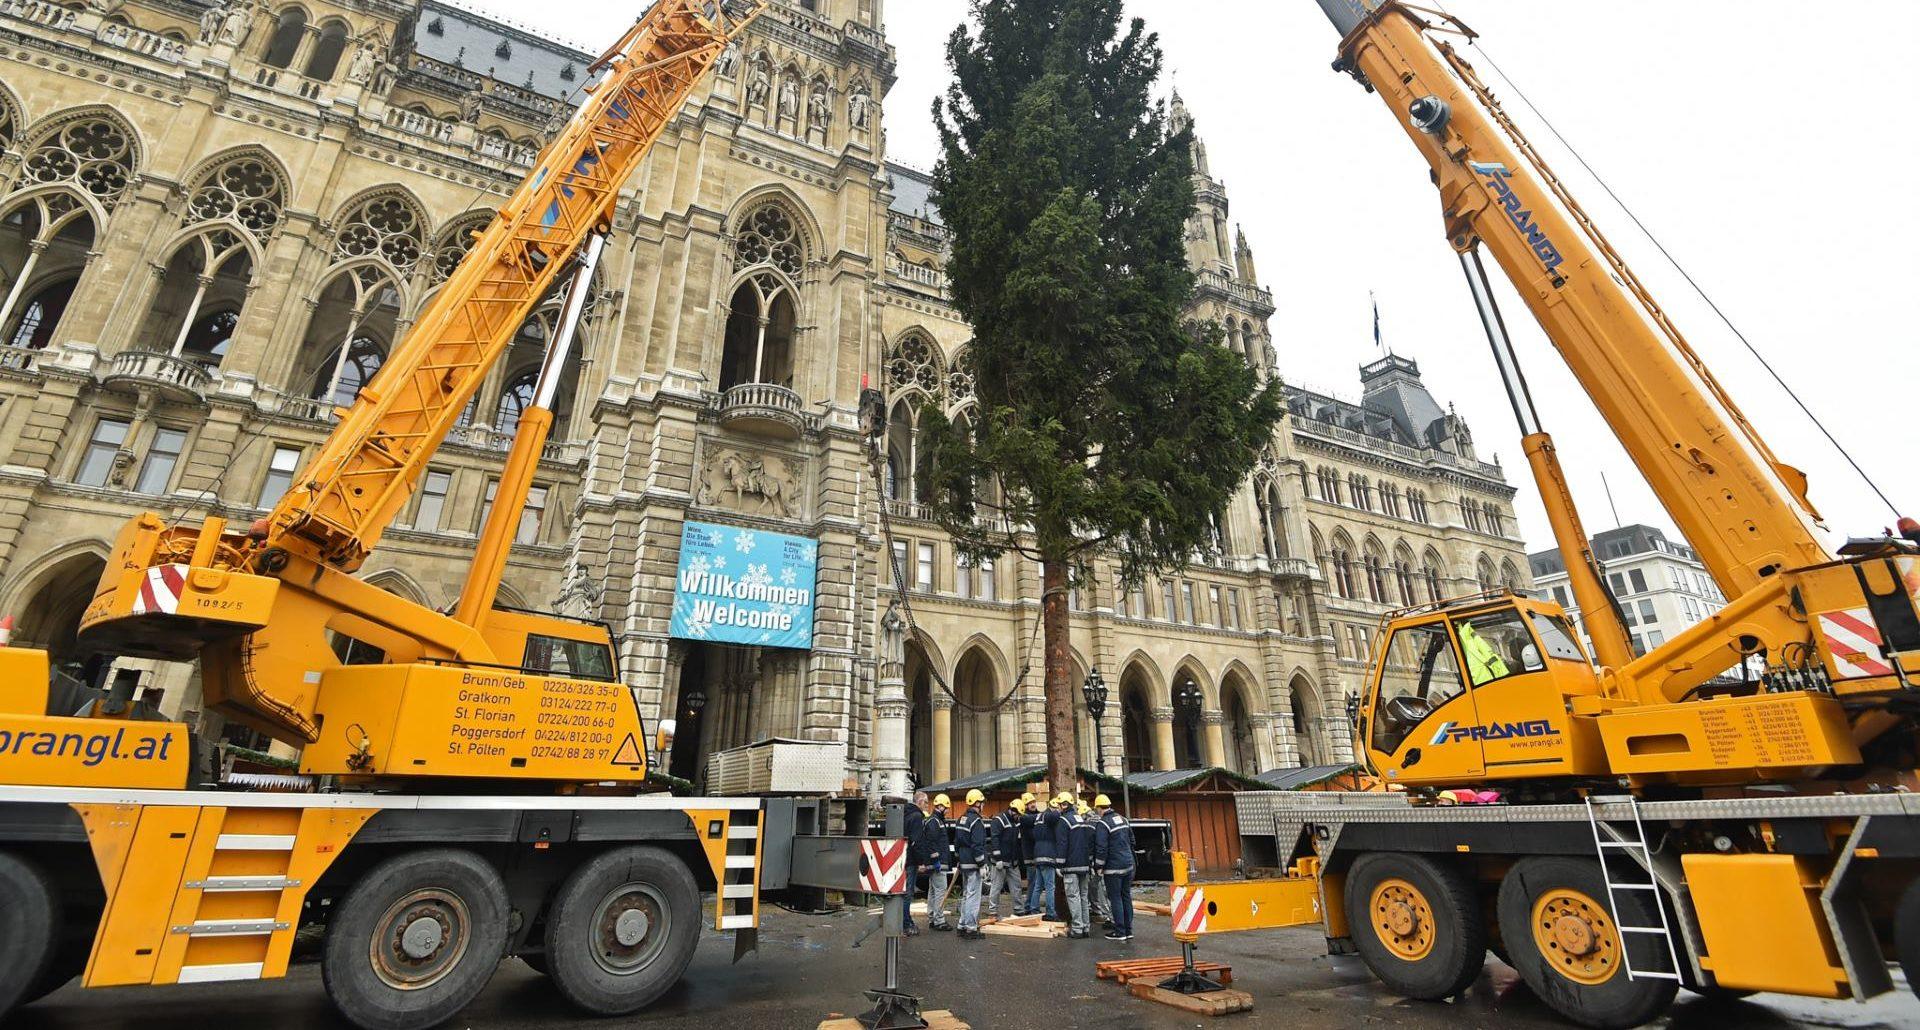 Božićno drvce u Grad Beč stiglo iz austrijske pokrajine Vorarlberg